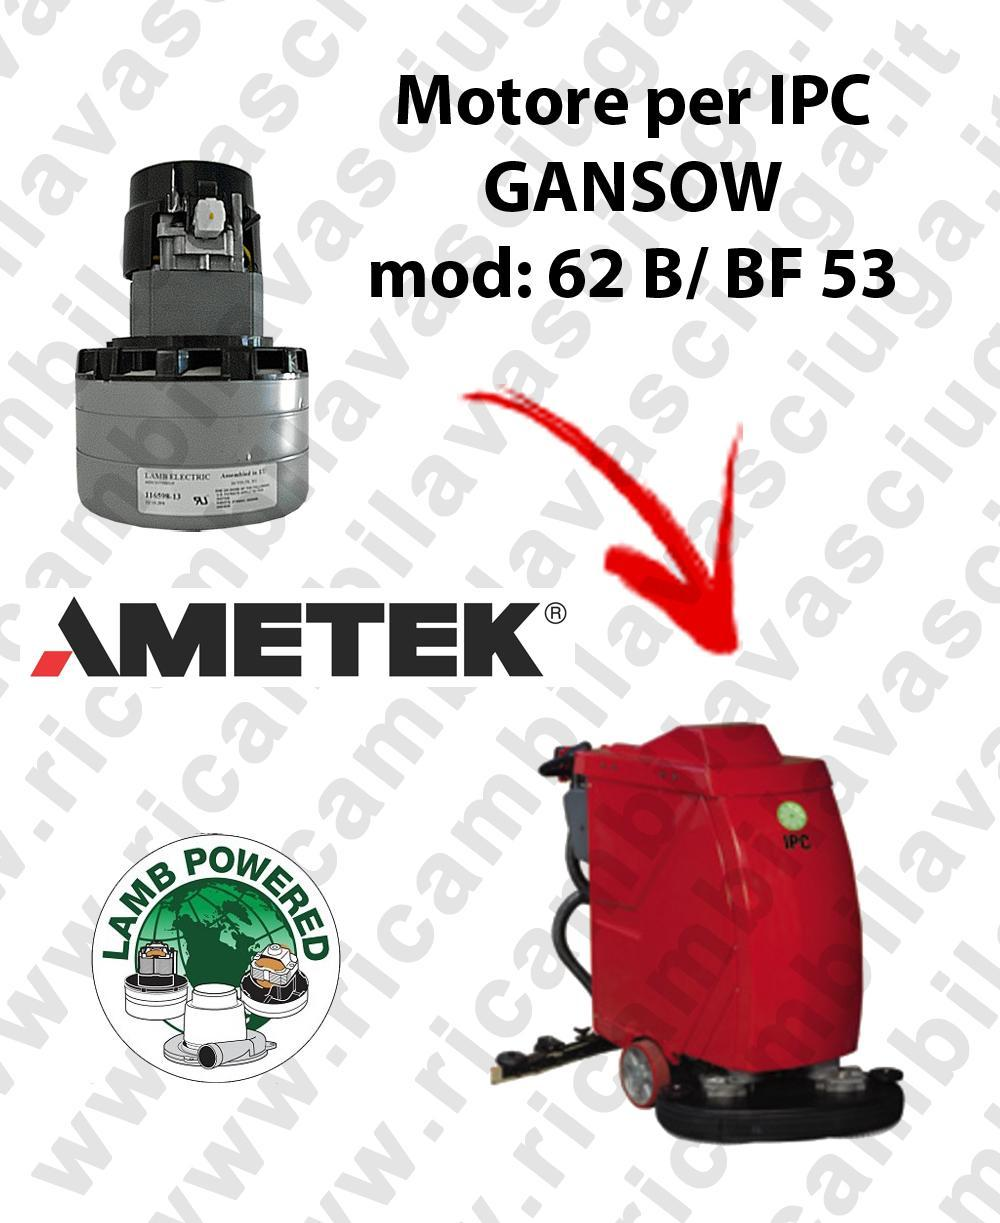 62 B/BF 53 LAMB AMETEK vacuum motor for scrubber dryer IPC GANSOW